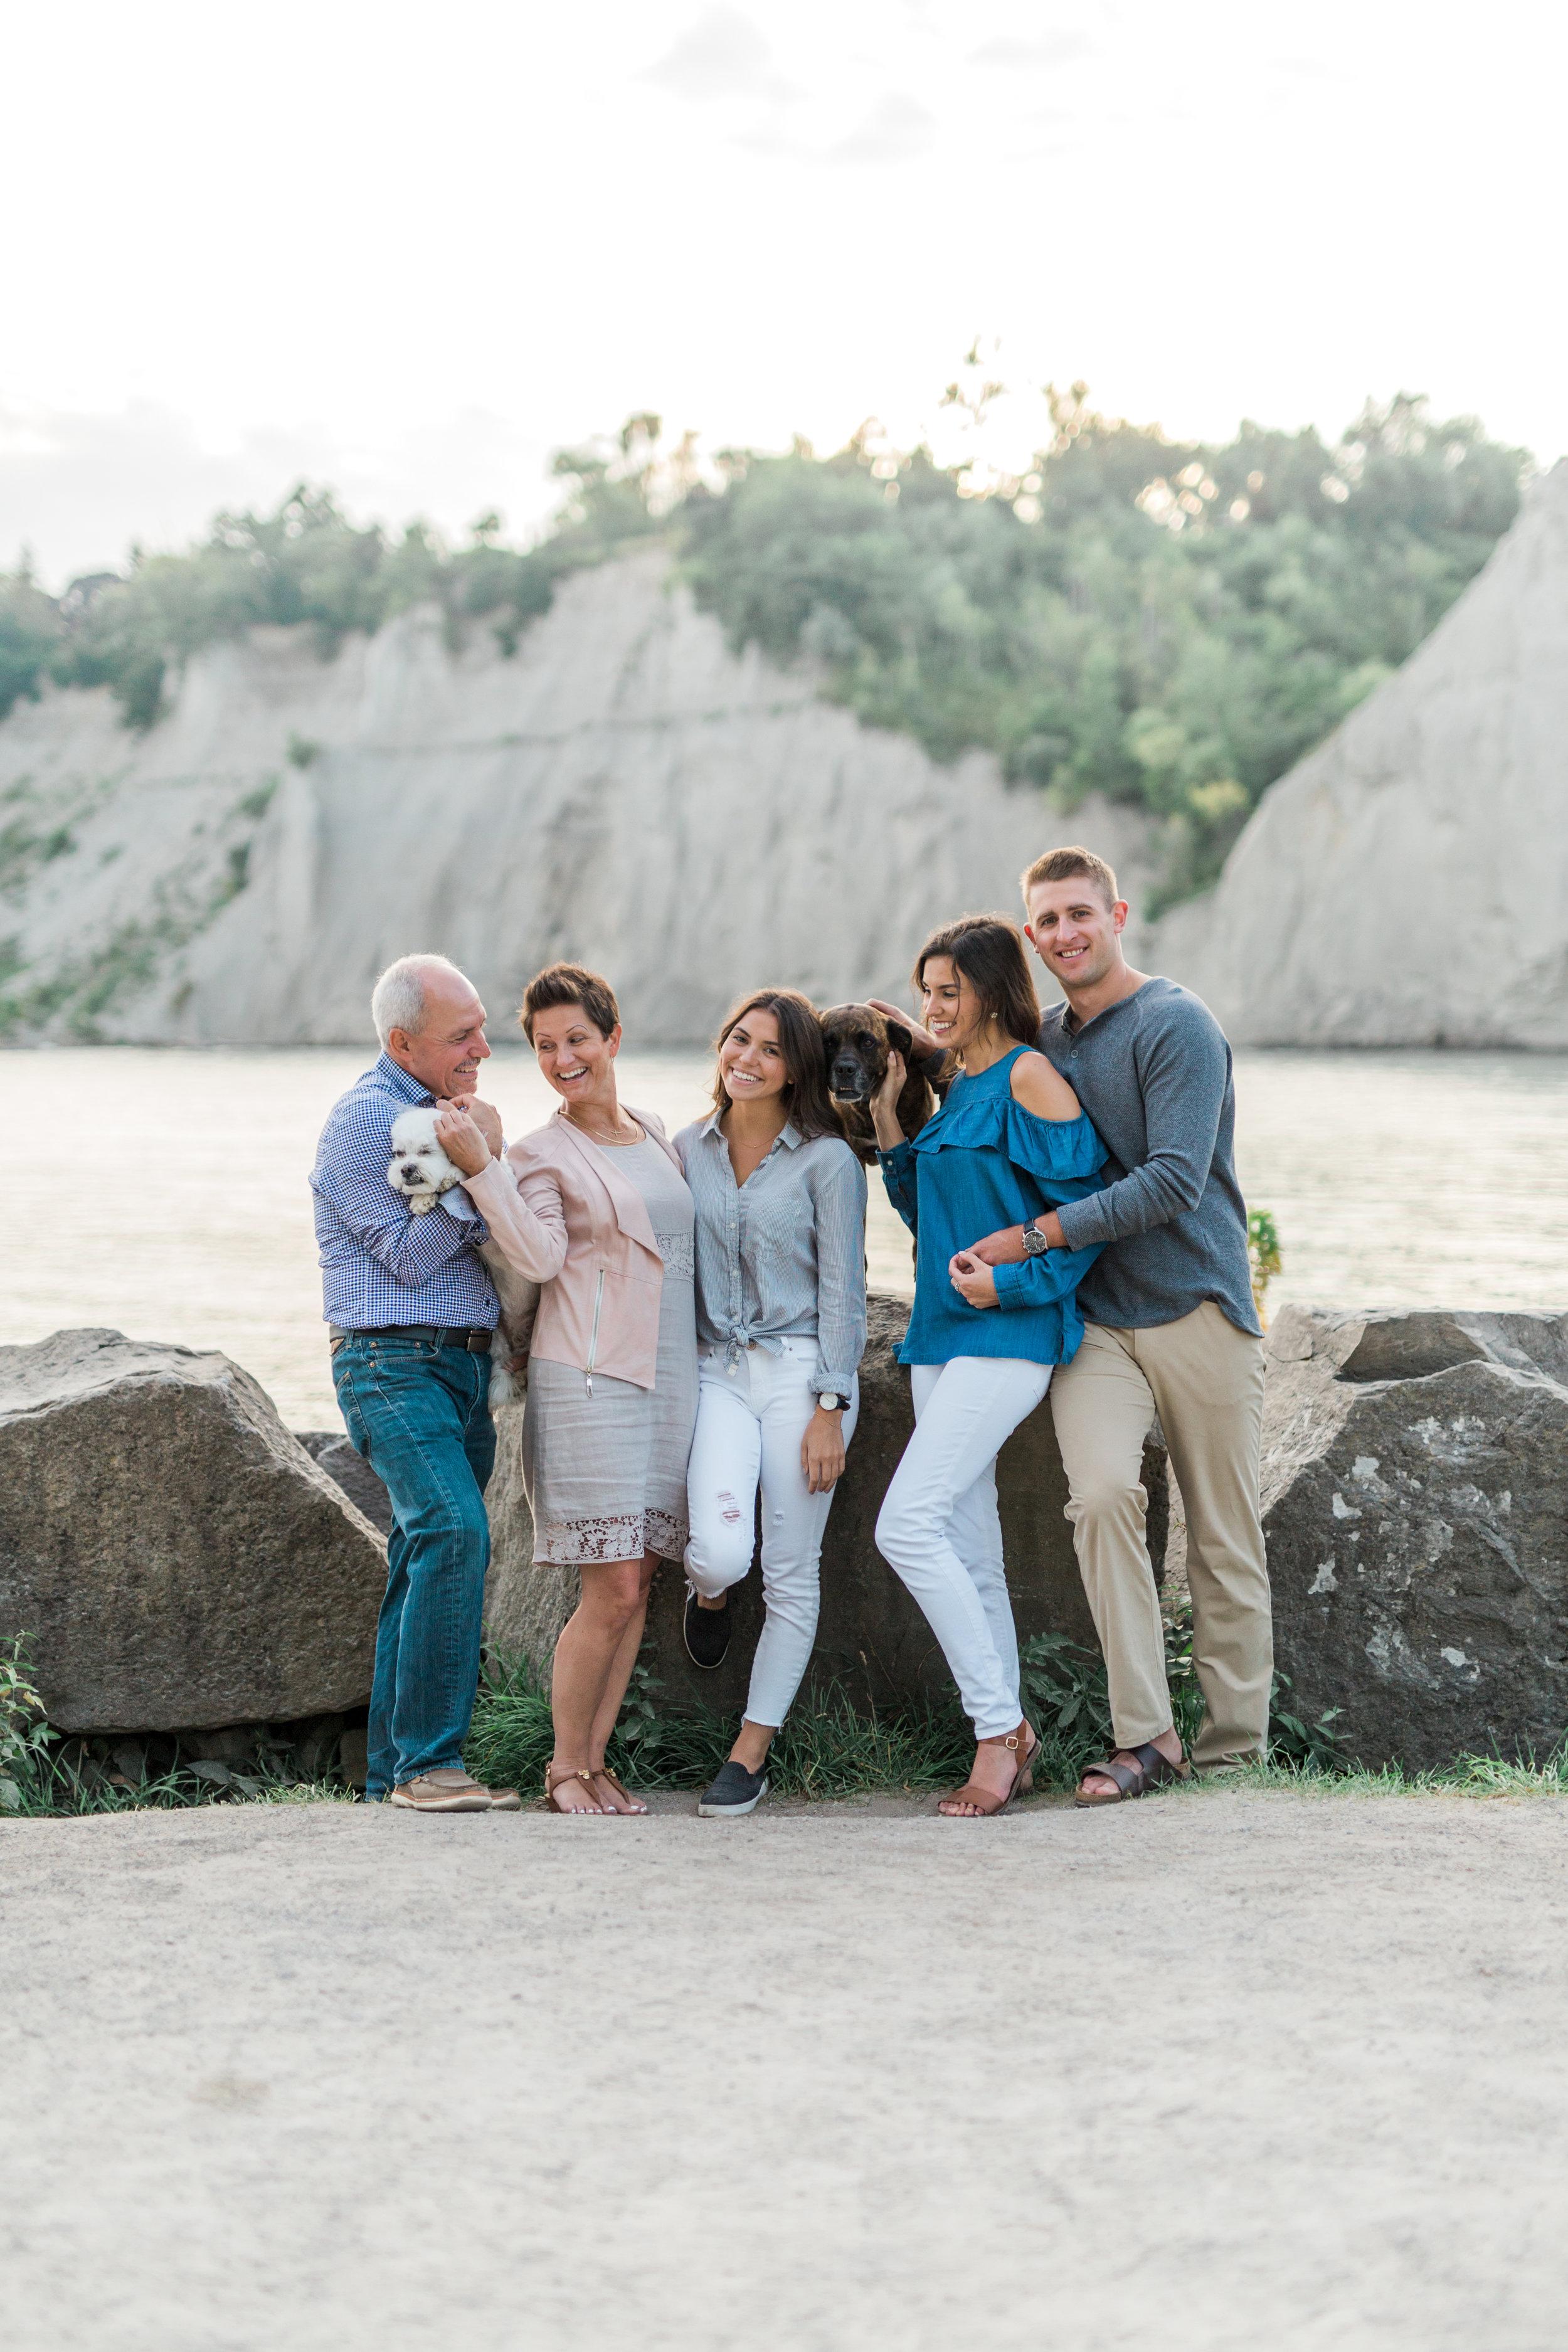 Danielle-Giroux-Amir-Golbazi-Genua-Family-Photography-Scarborough-Bluffs-9366.jpg